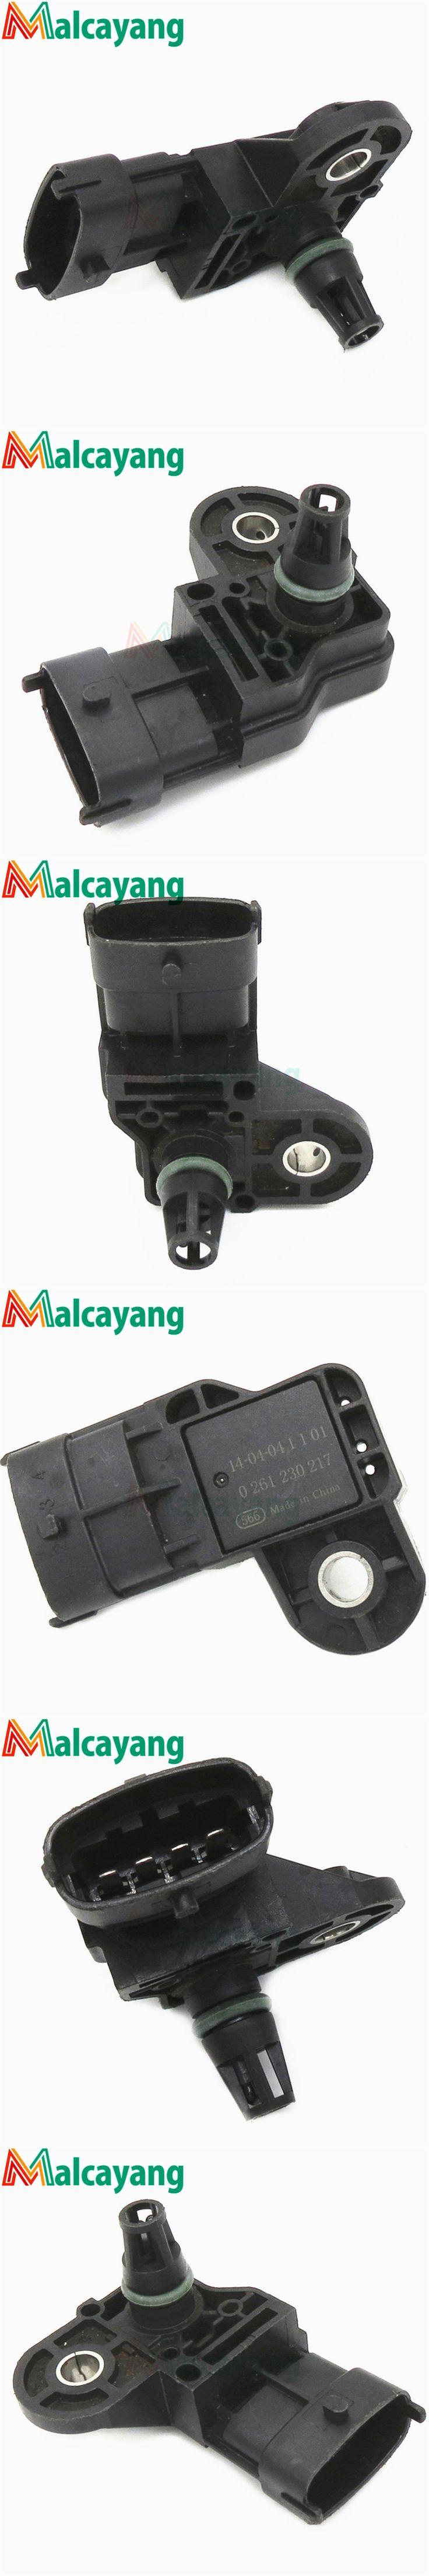 Brand New Intake Manifold Pressure MAP Sensor For GM Opel Blazer S10 Captiva Astra Vectra Zafira 2.0L 2.4L 0261230217, 94705196